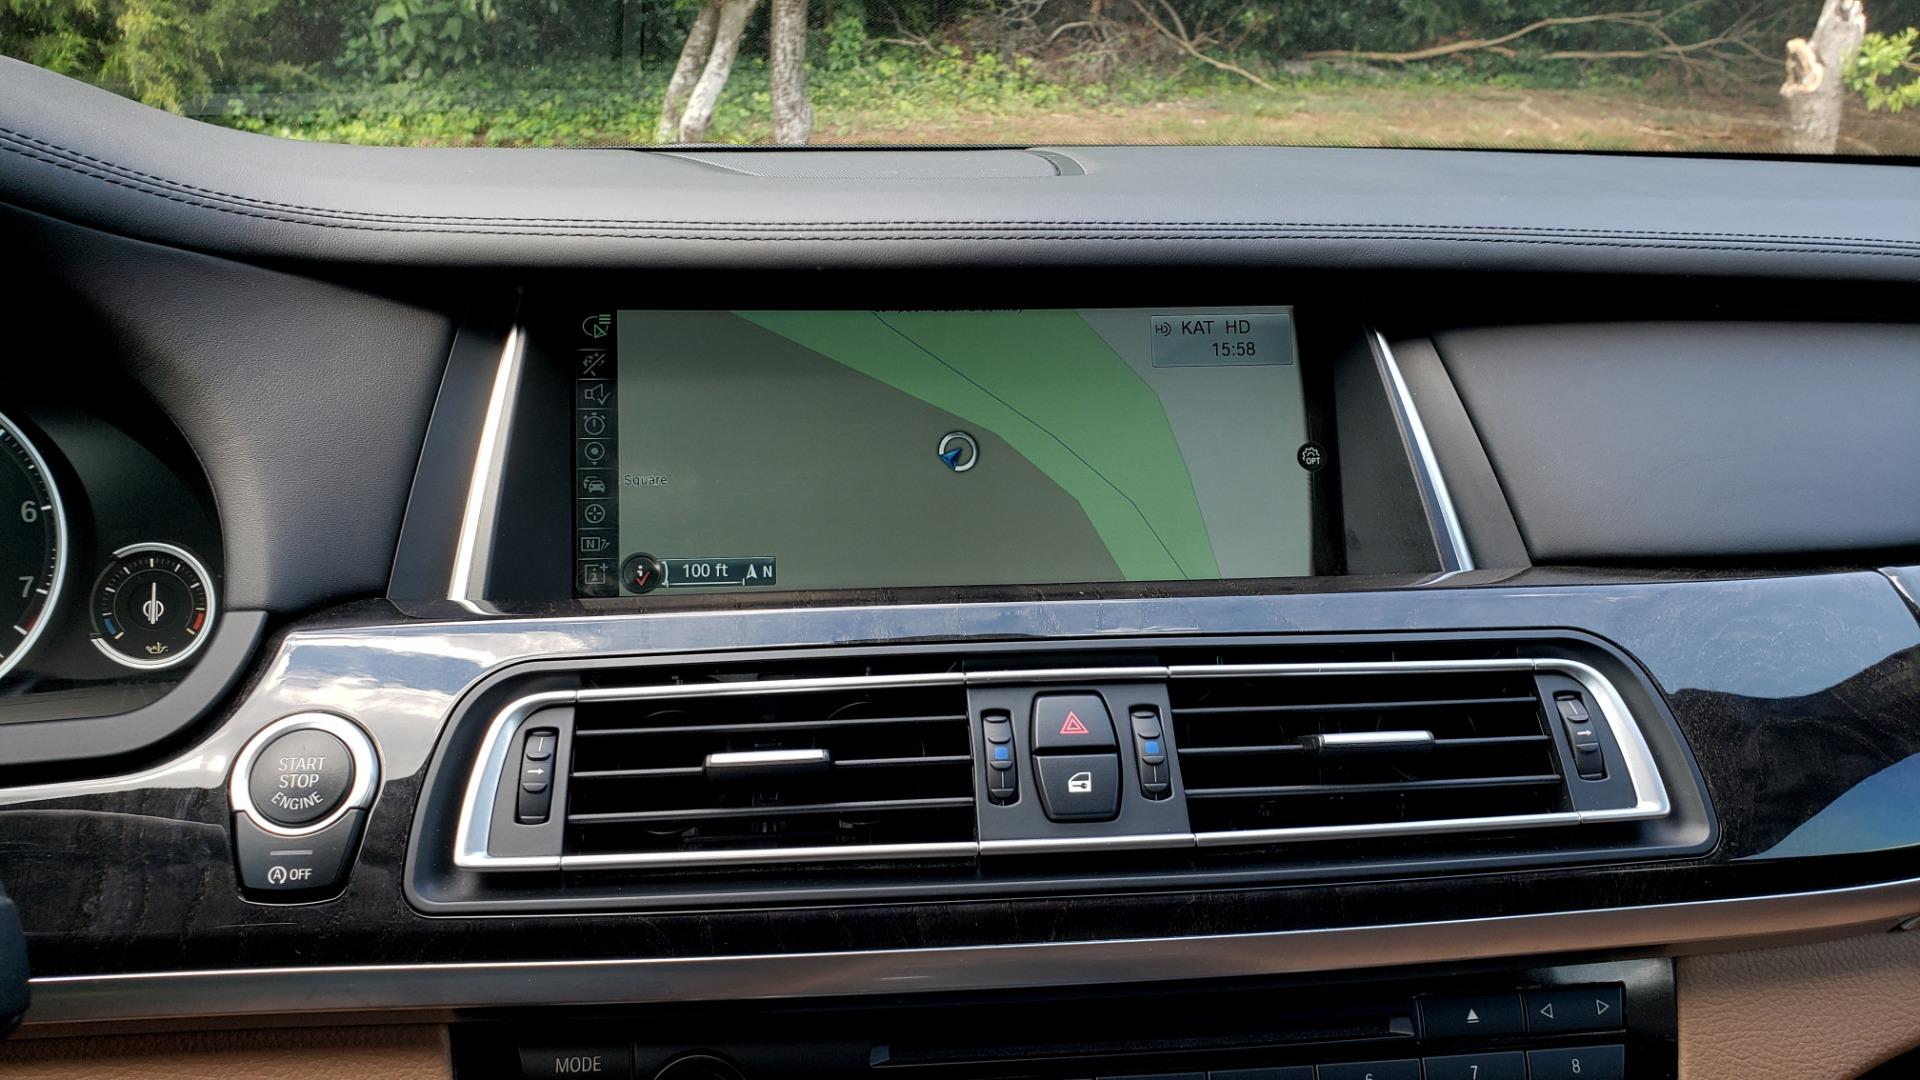 Used 2014 BMW 7 SERIES 750LI M-SPORT / EXEC PKG / DRVR ASST / LIGHTING / NAV / SUNROOF for sale Sold at Formula Imports in Charlotte NC 28227 43